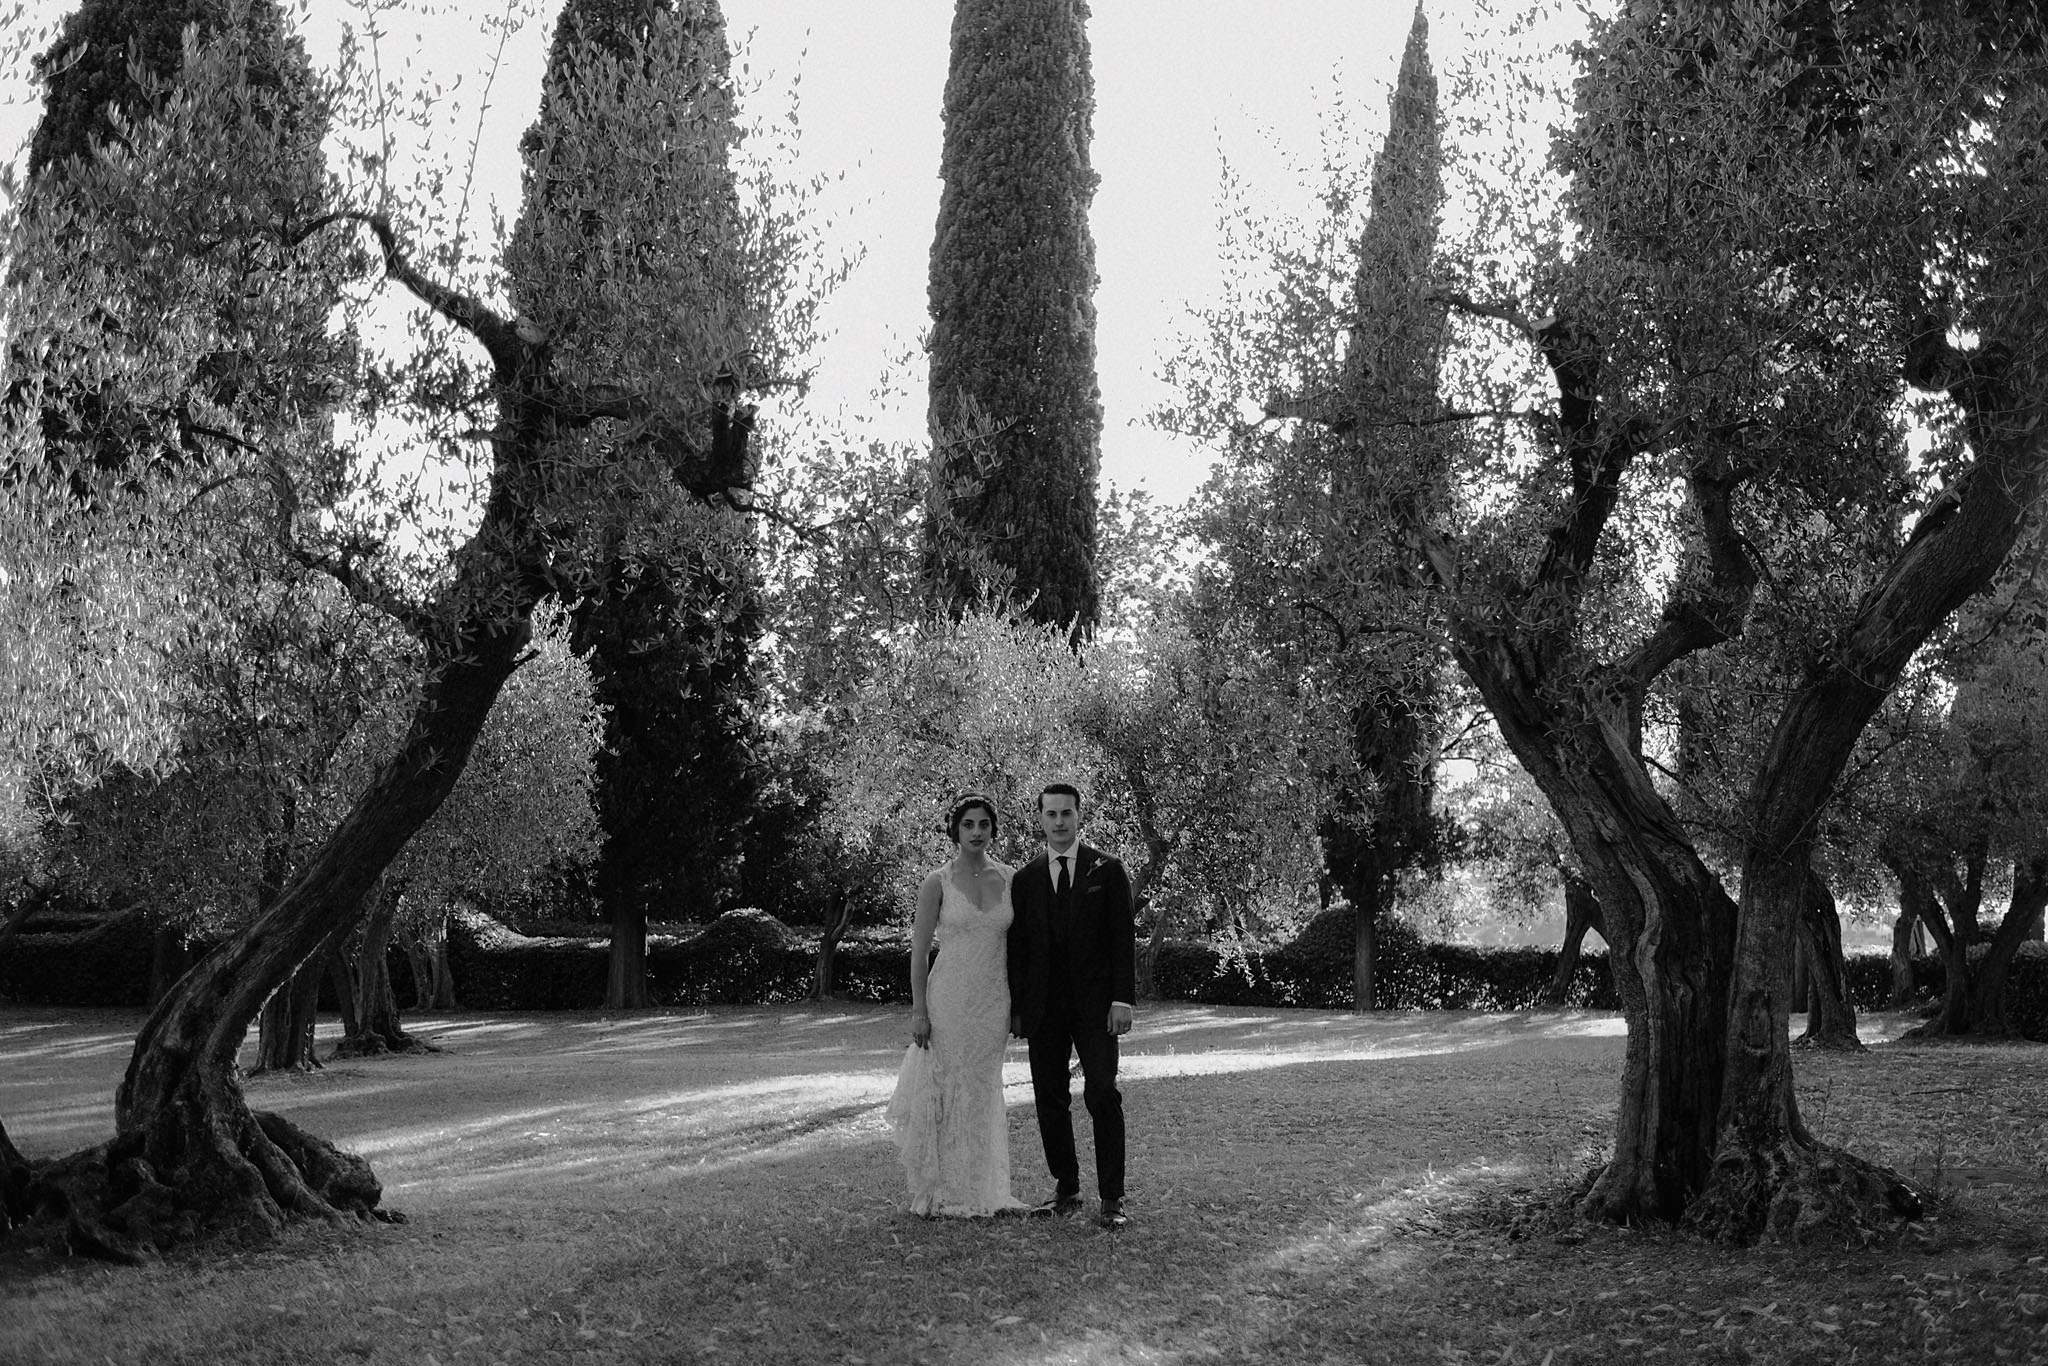 Max-Steph-Italy-Wedding-539.jpg